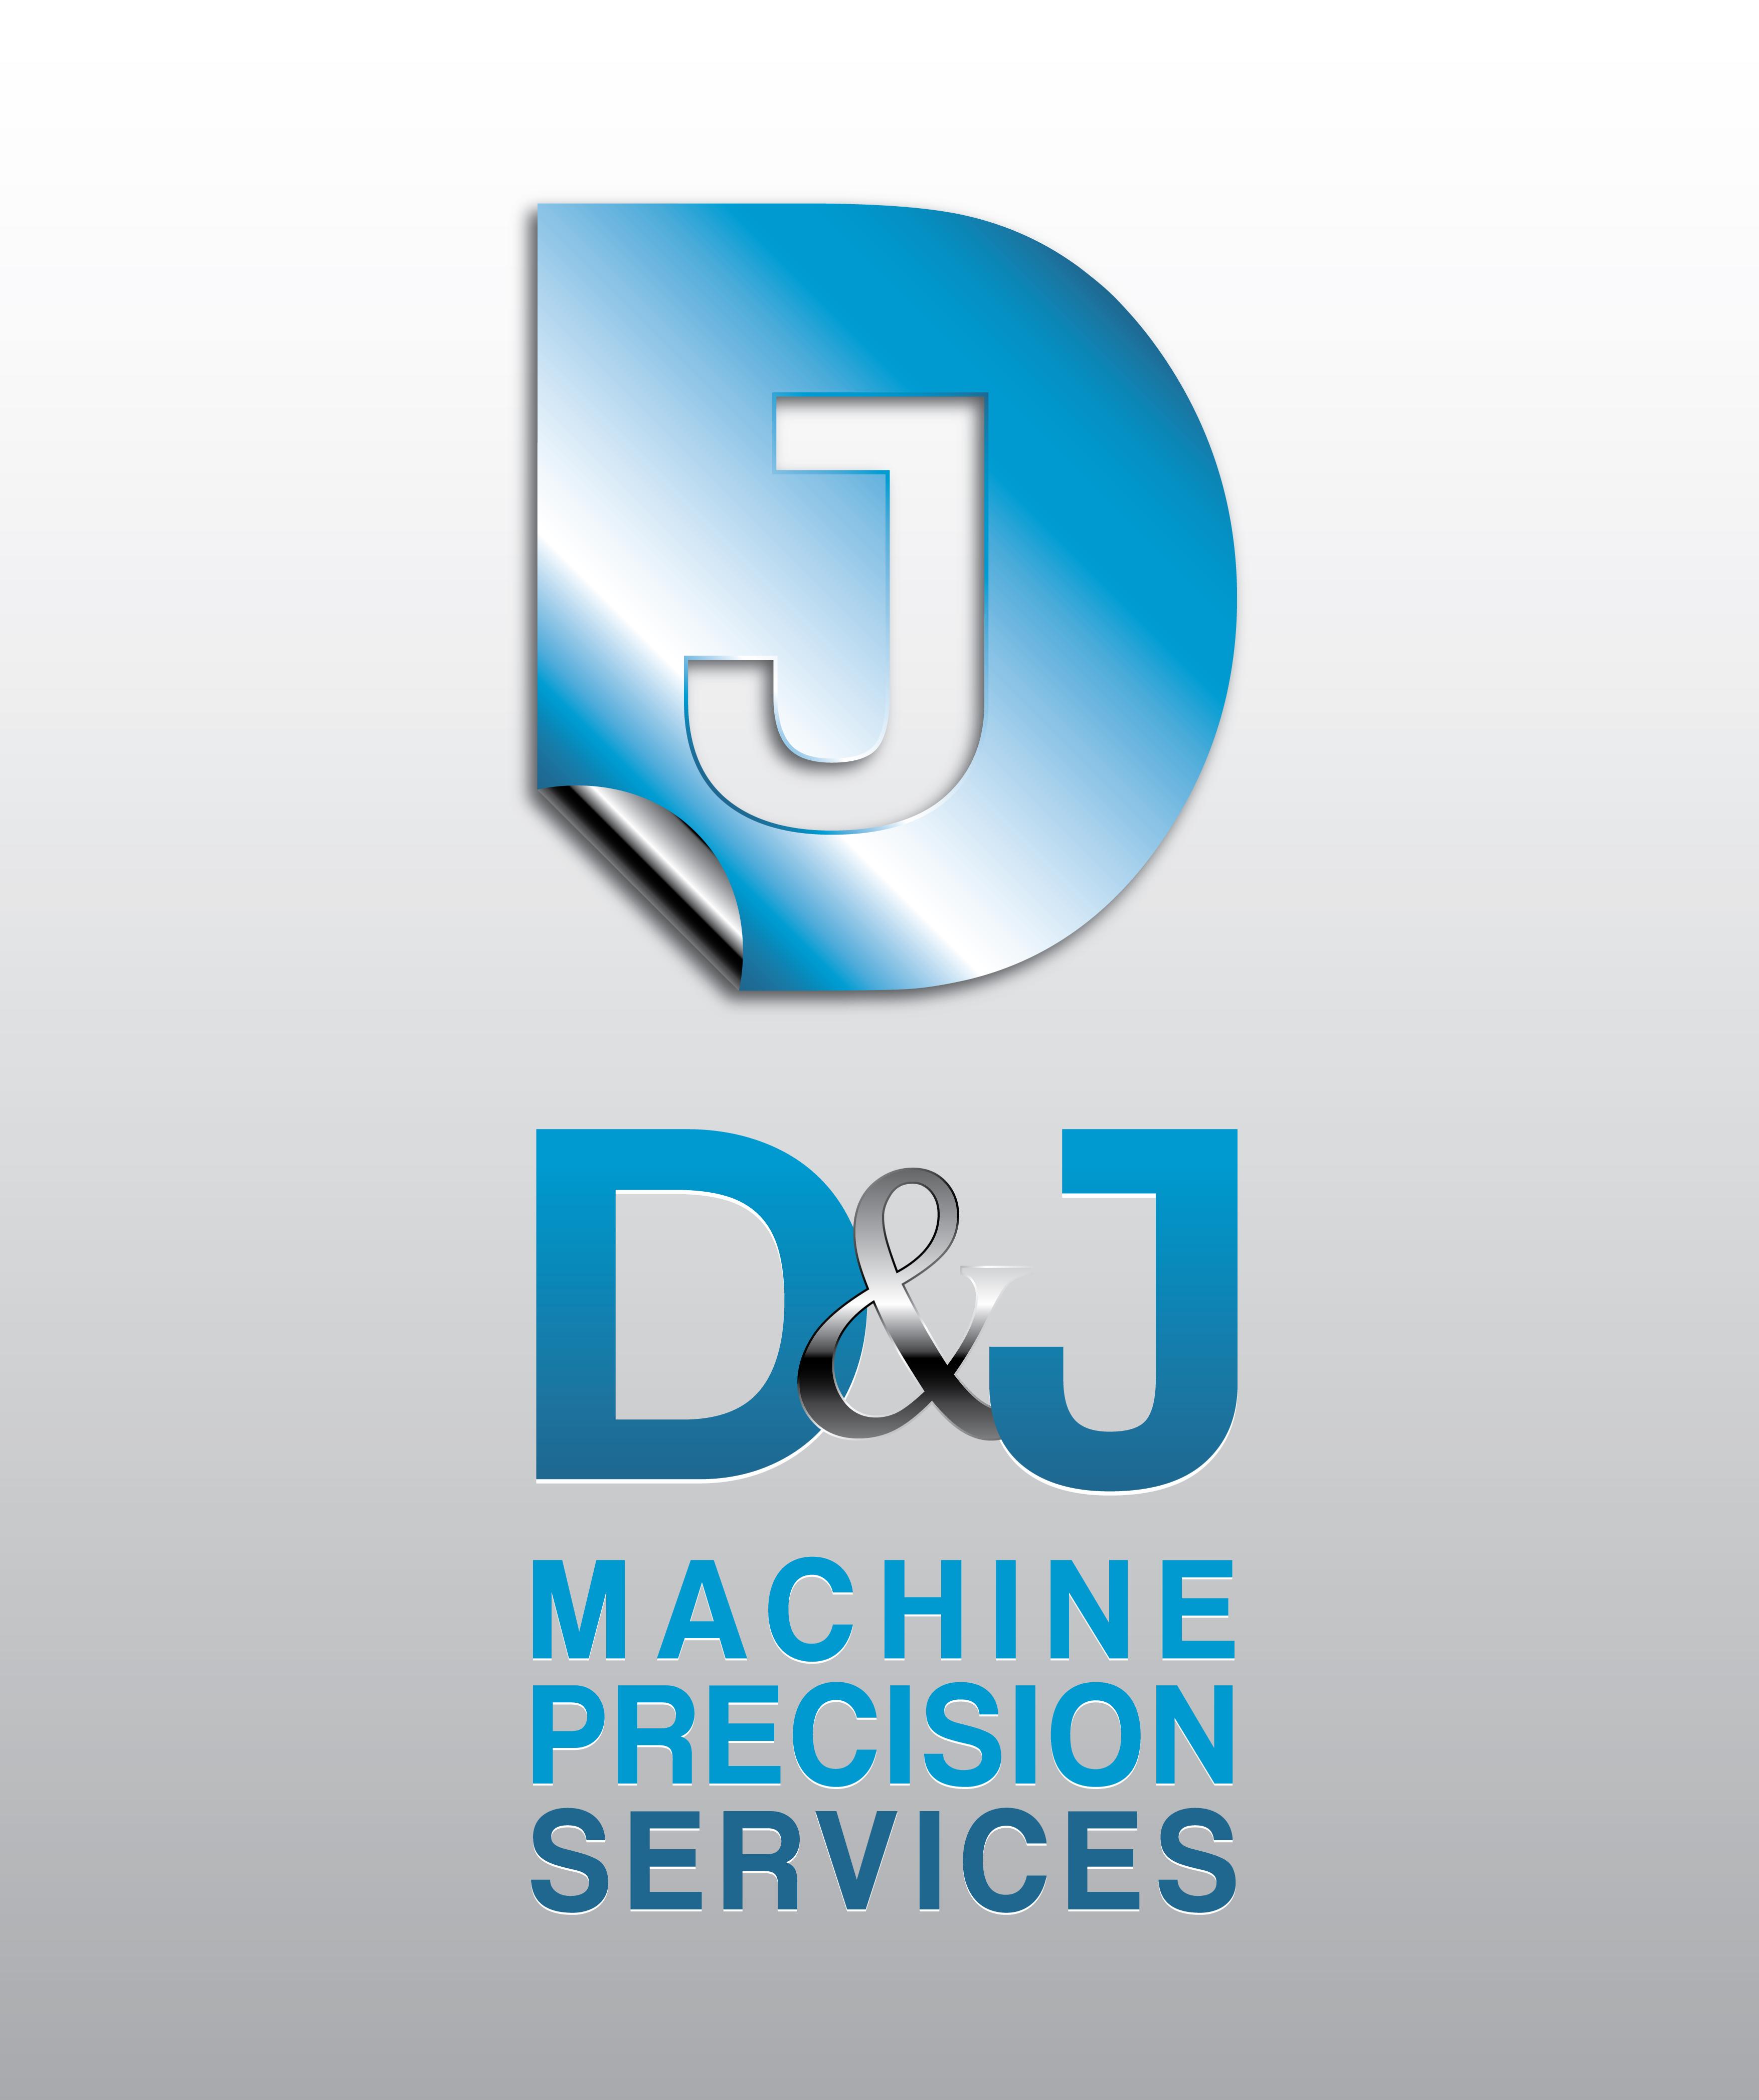 Logo Design by Private User - Entry No. 131 in the Logo Design Contest Creative Logo Design for D & J's Precision Machine Services.